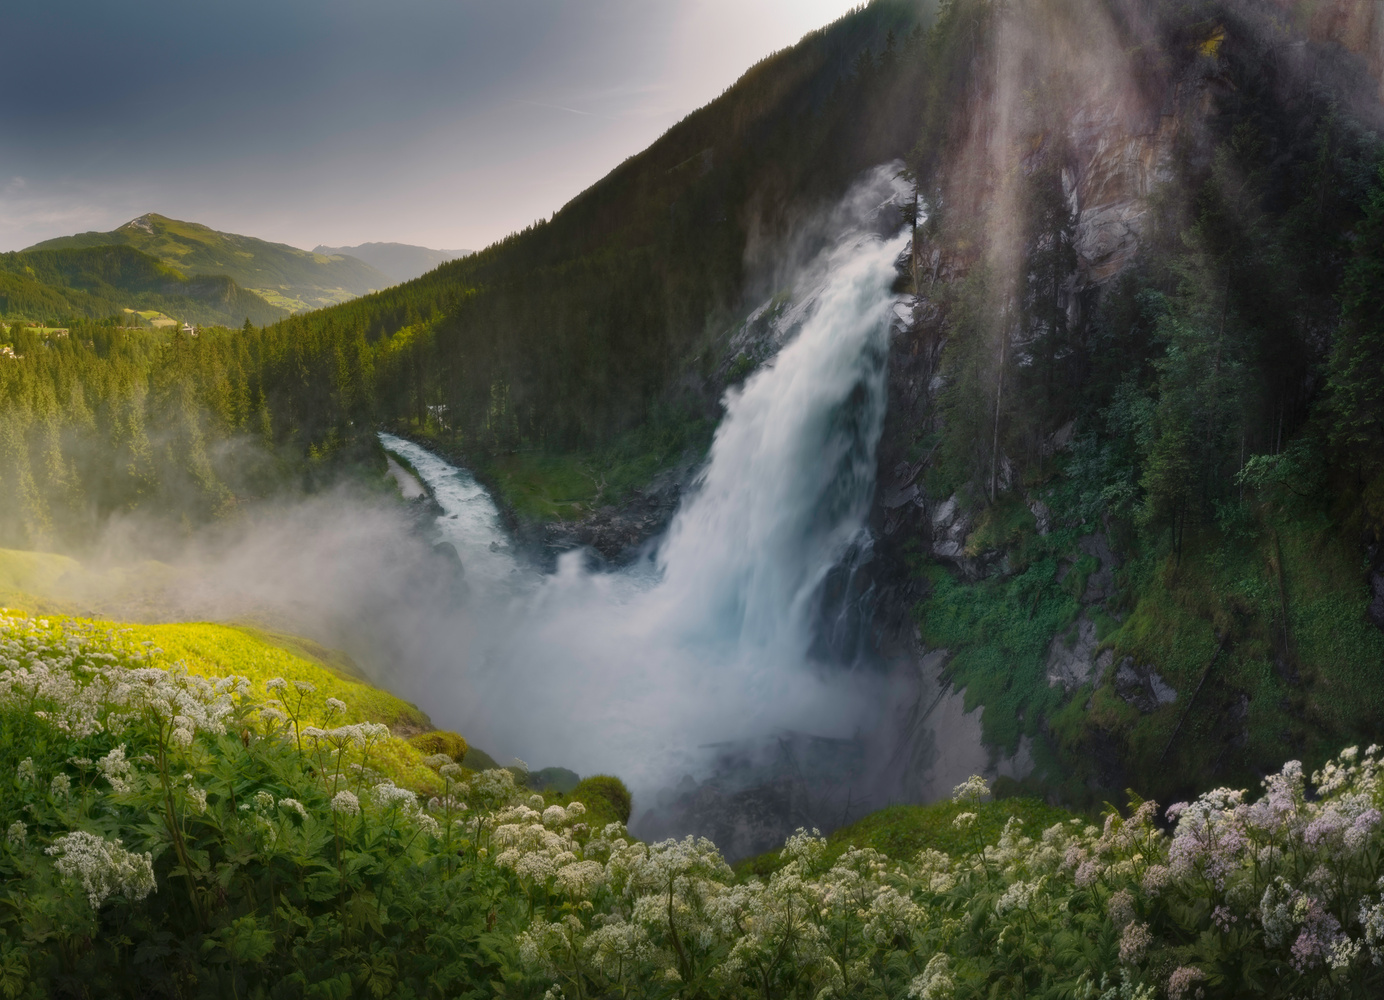 Krimml Waterfall by Corin Vilanek